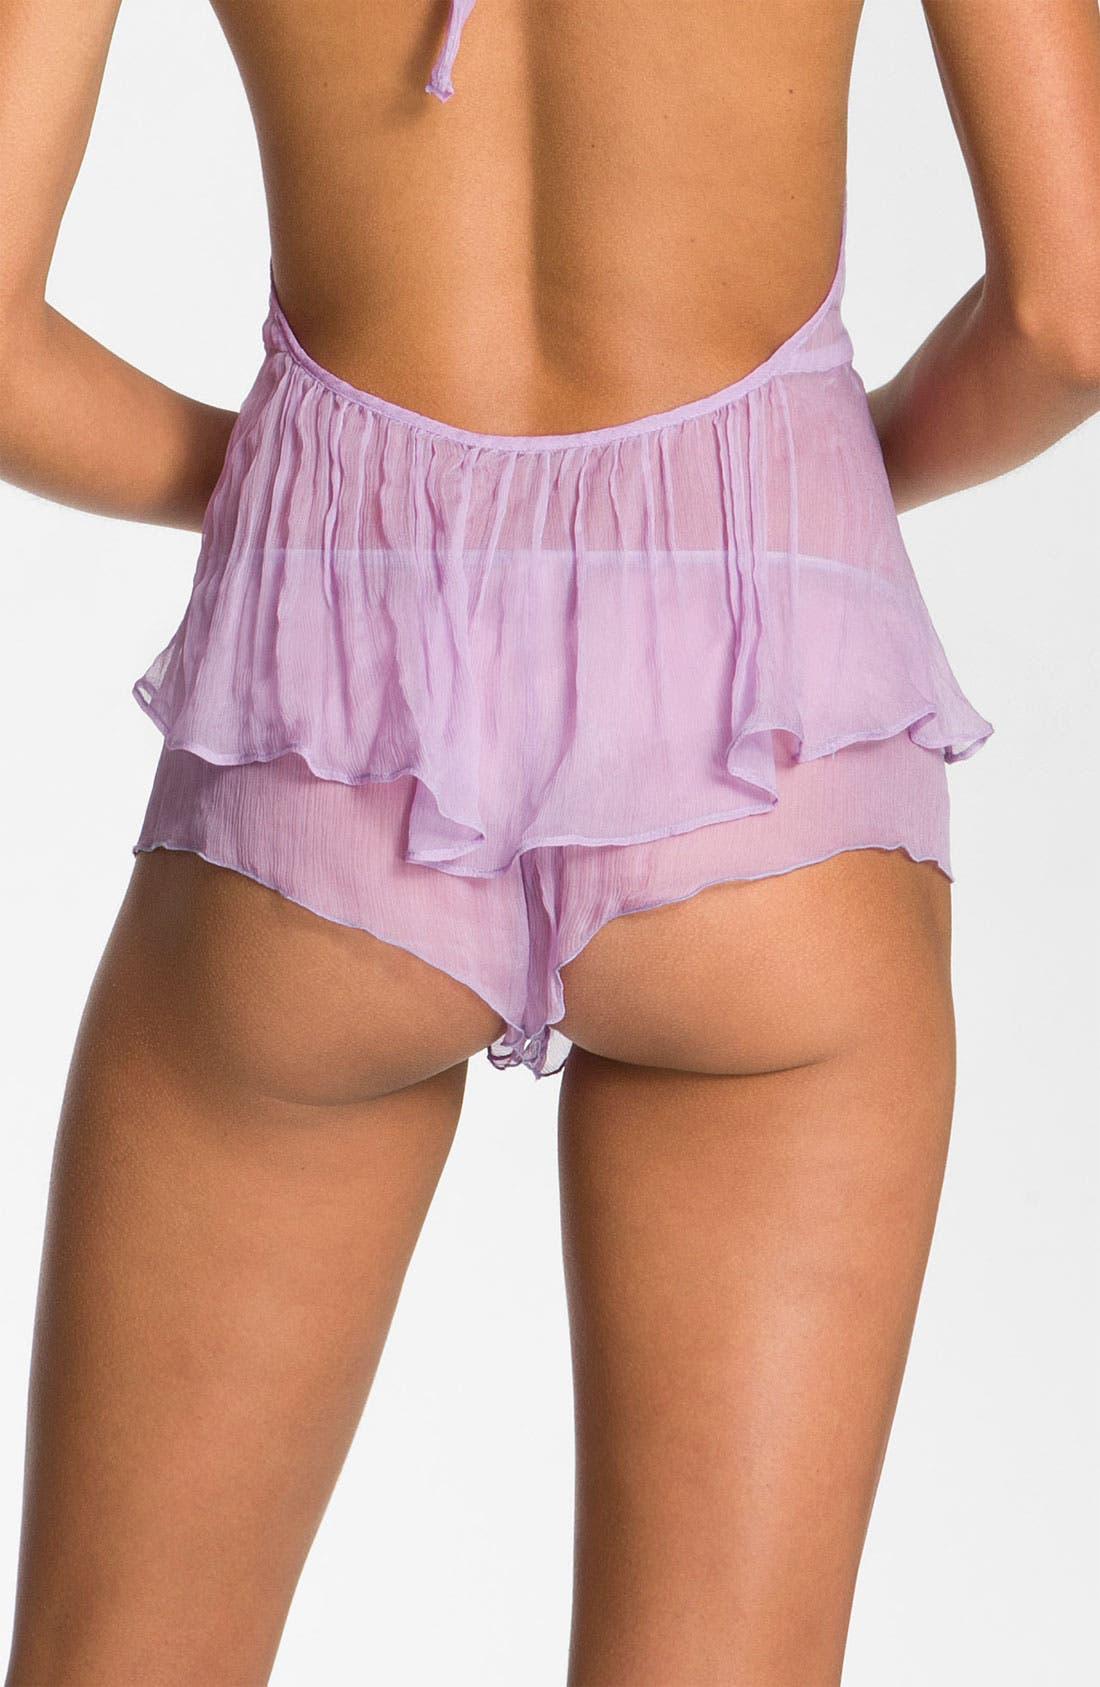 Alternate Image 2  - Zinke 'First Kiss' Flutter Shorts